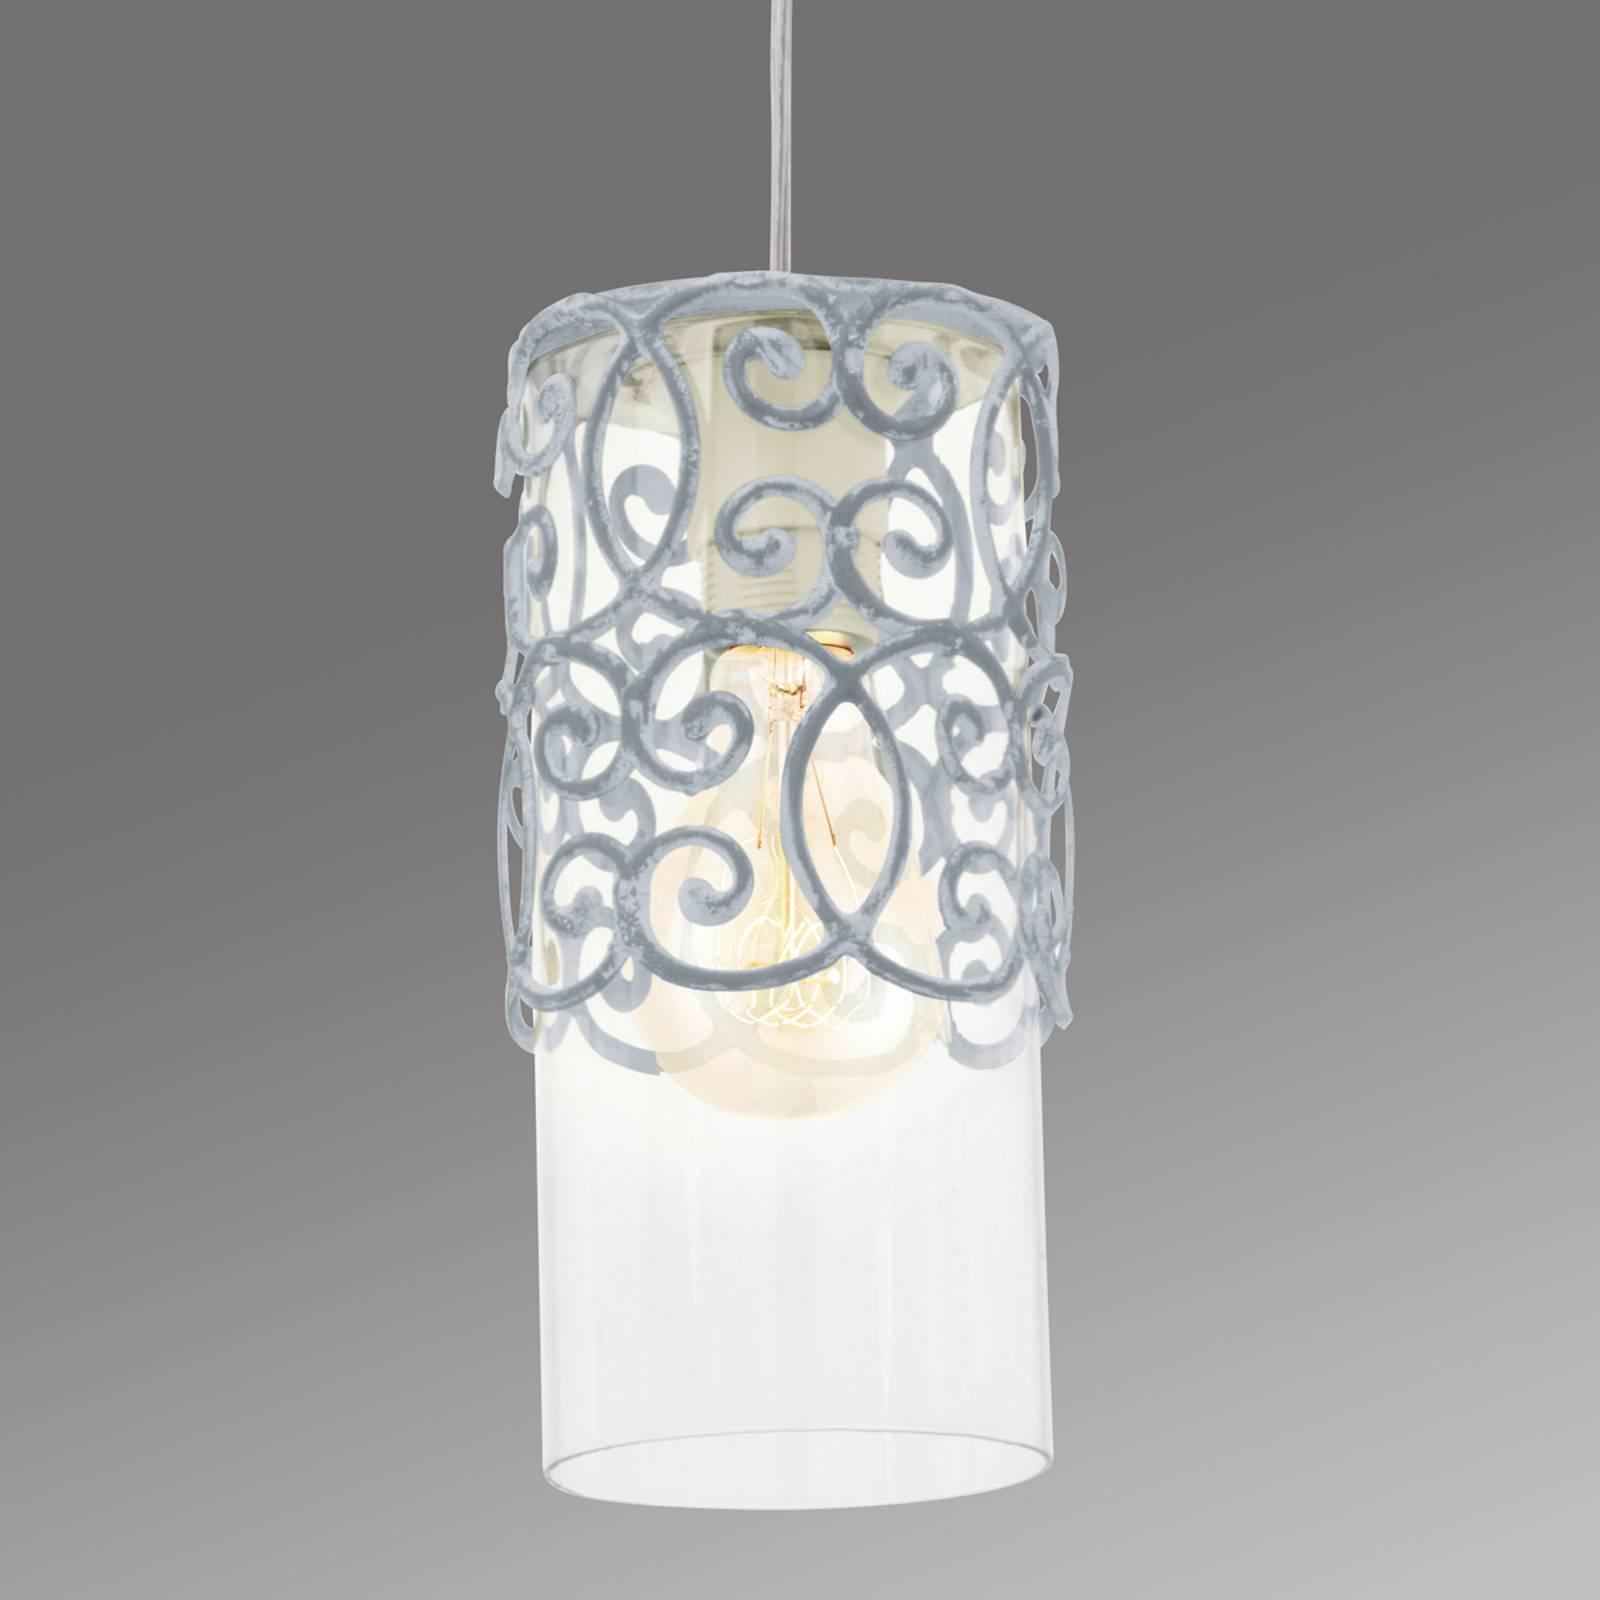 Grijsblauwe hanglamp Vintage